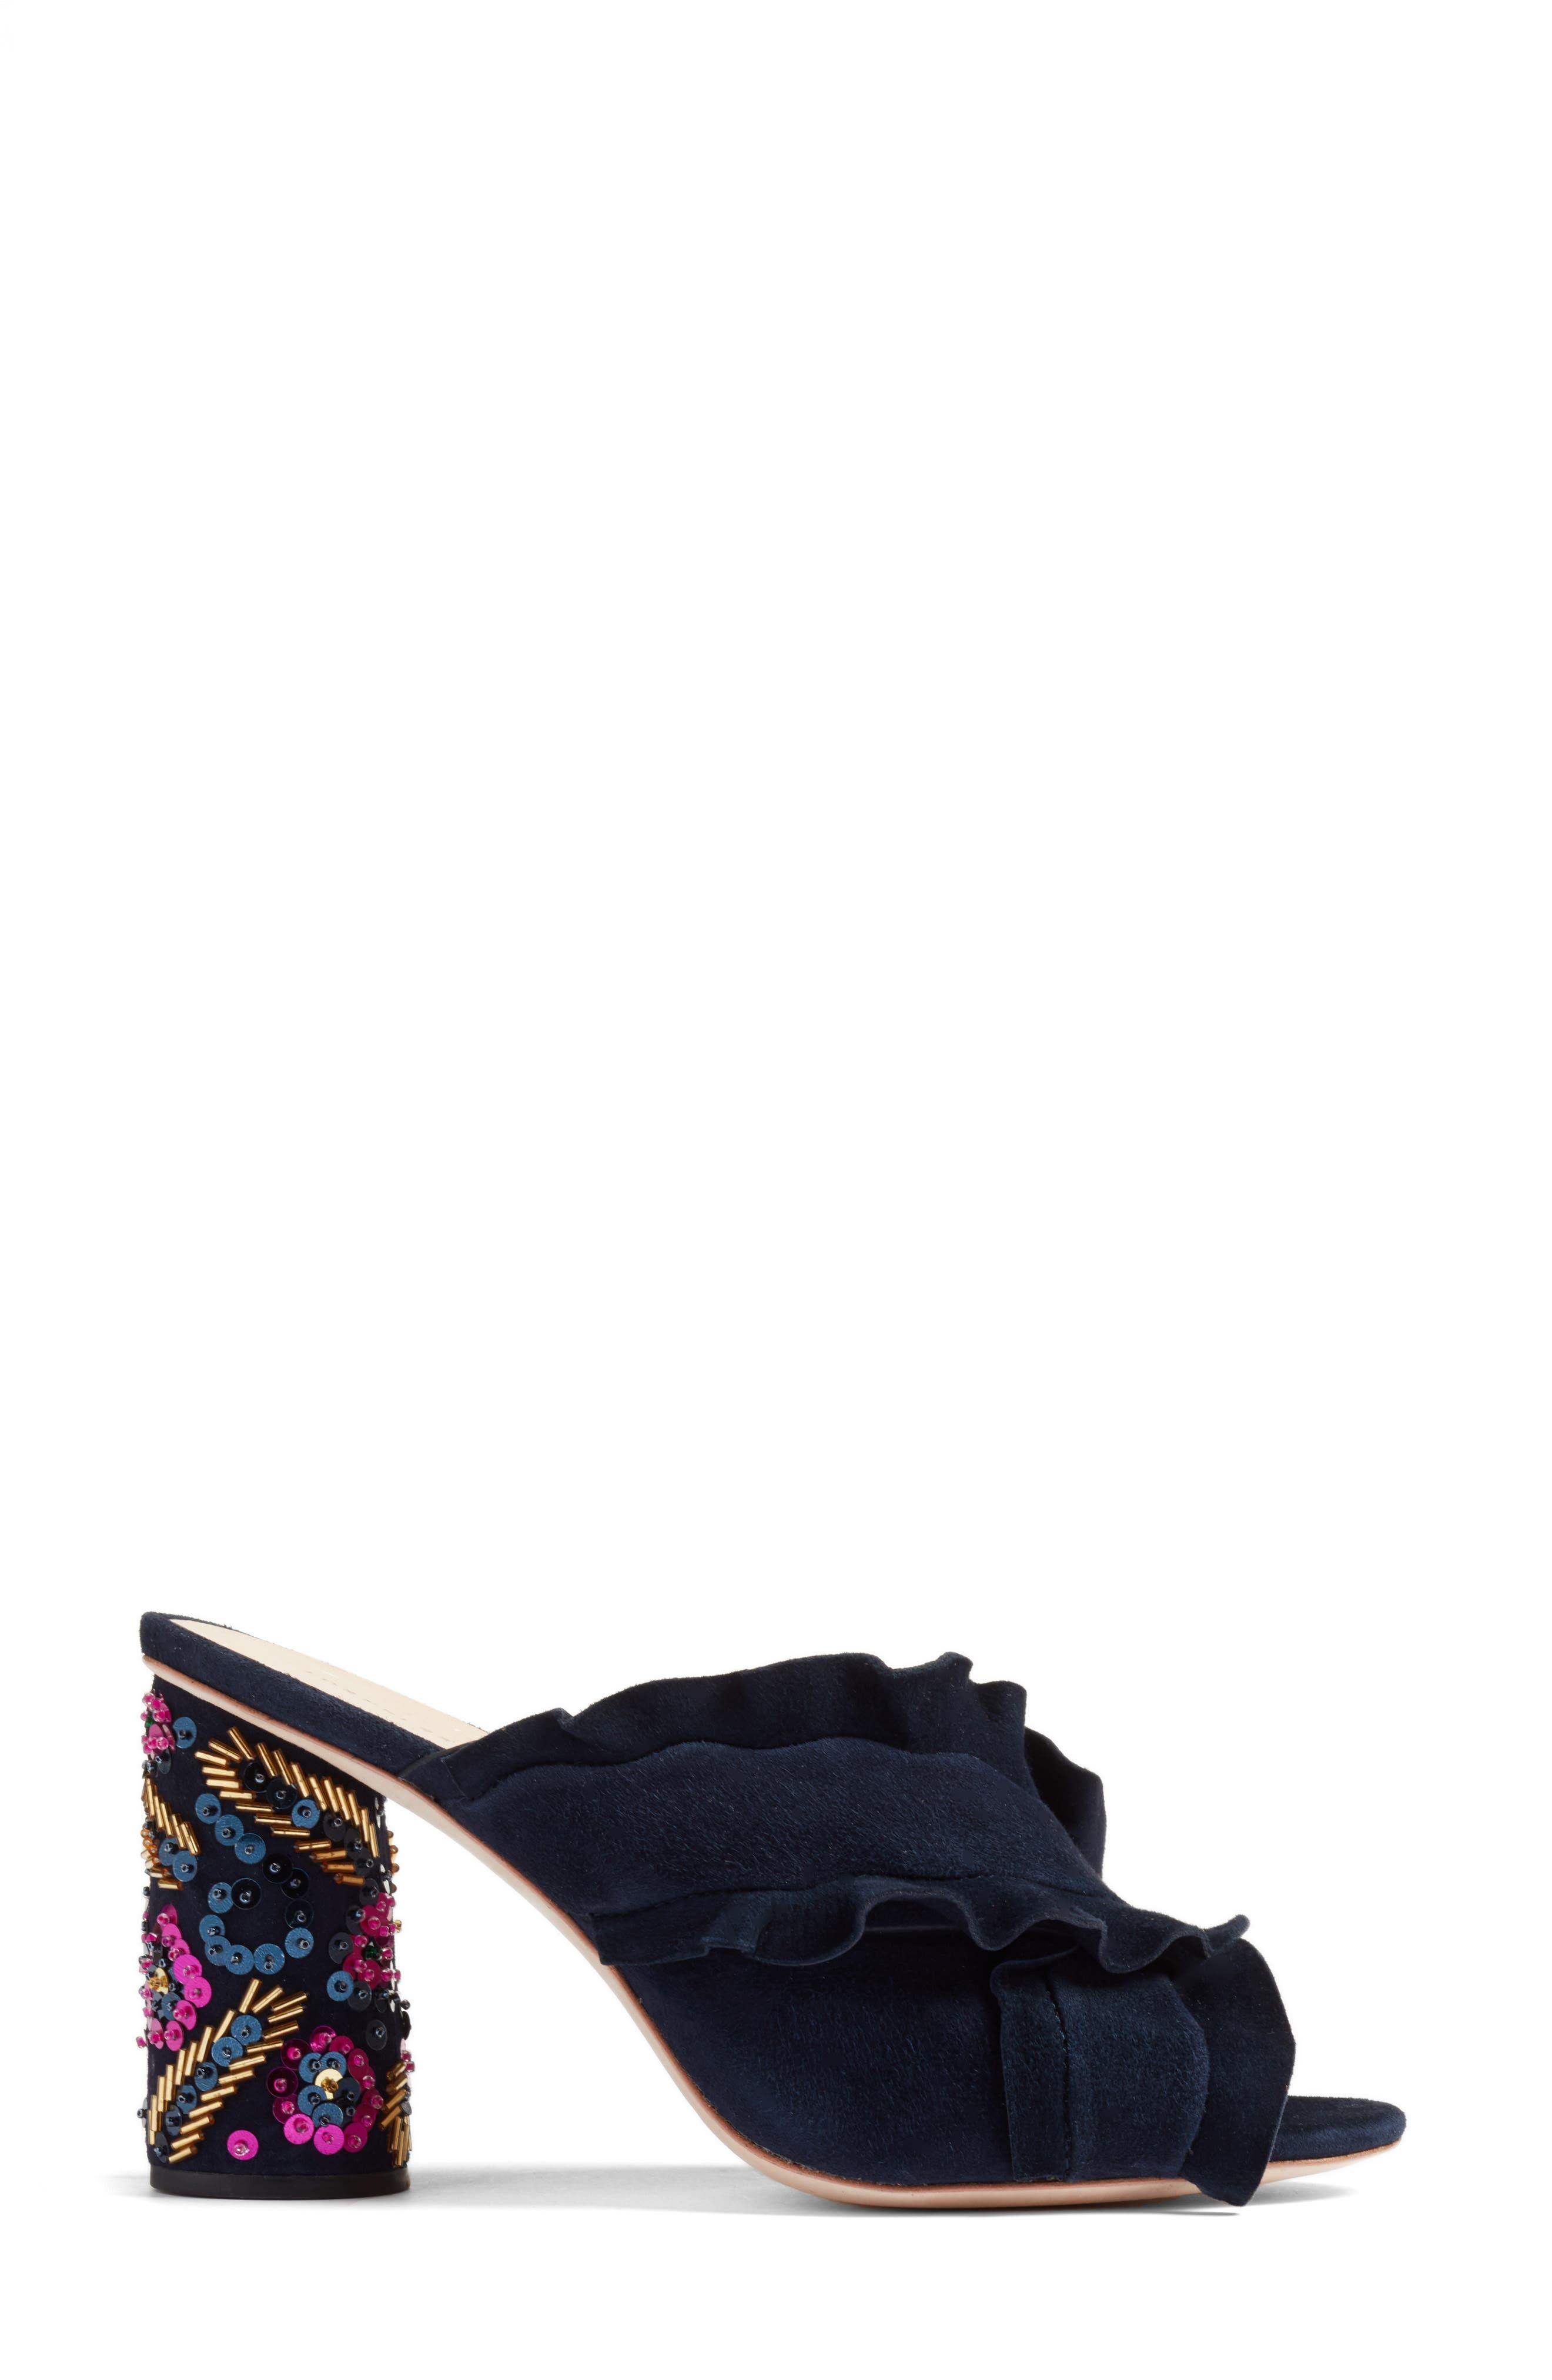 Alternate Image 3  - Loeffler Randall Kaya Embellished Ruffle Slide Sandal (Women)